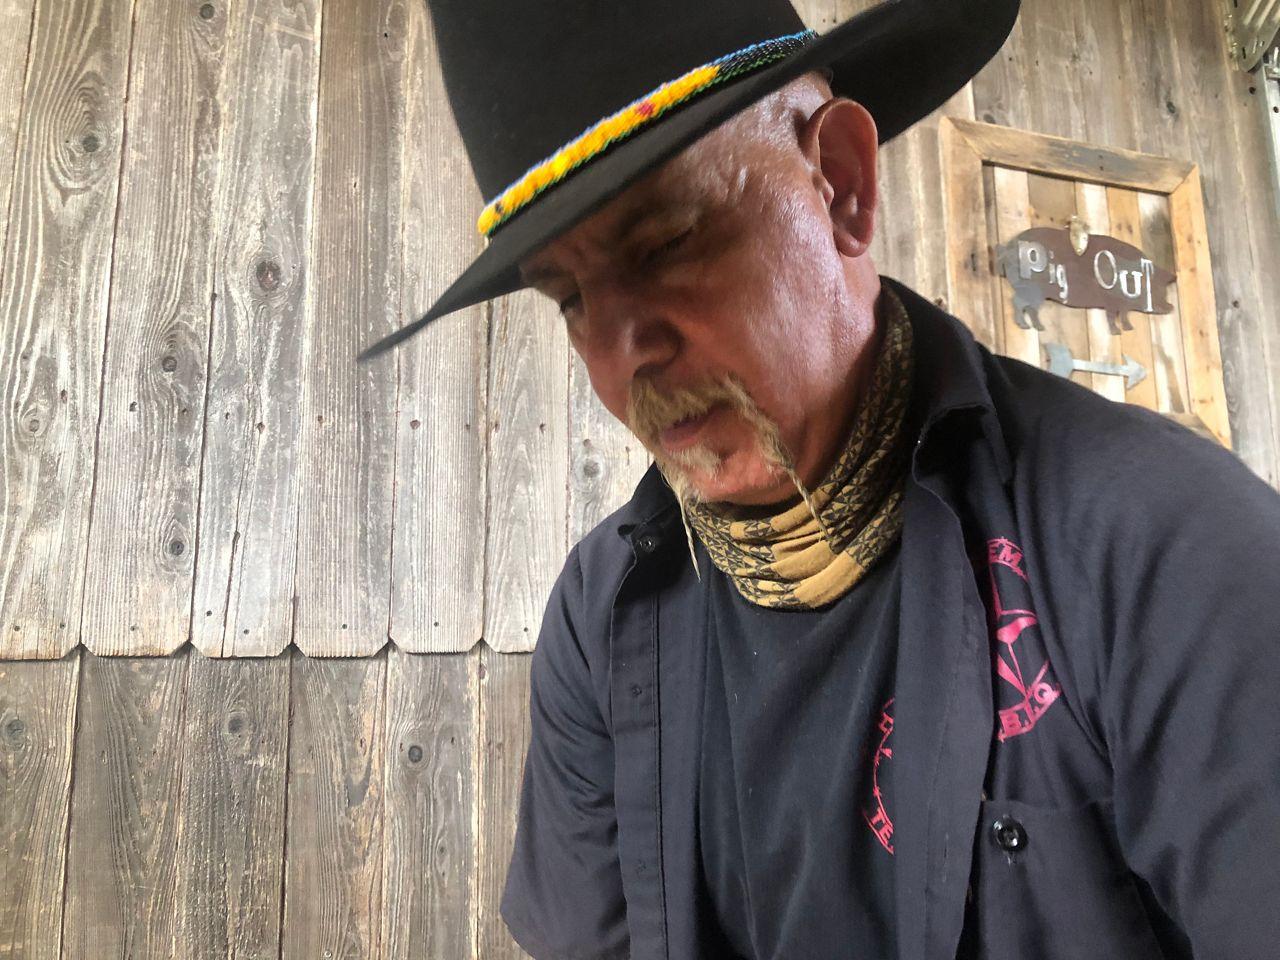 Ara Malekian seasons meat at Harlem Road Texas Barbecue. (Bryan Boes/Spectrum News)